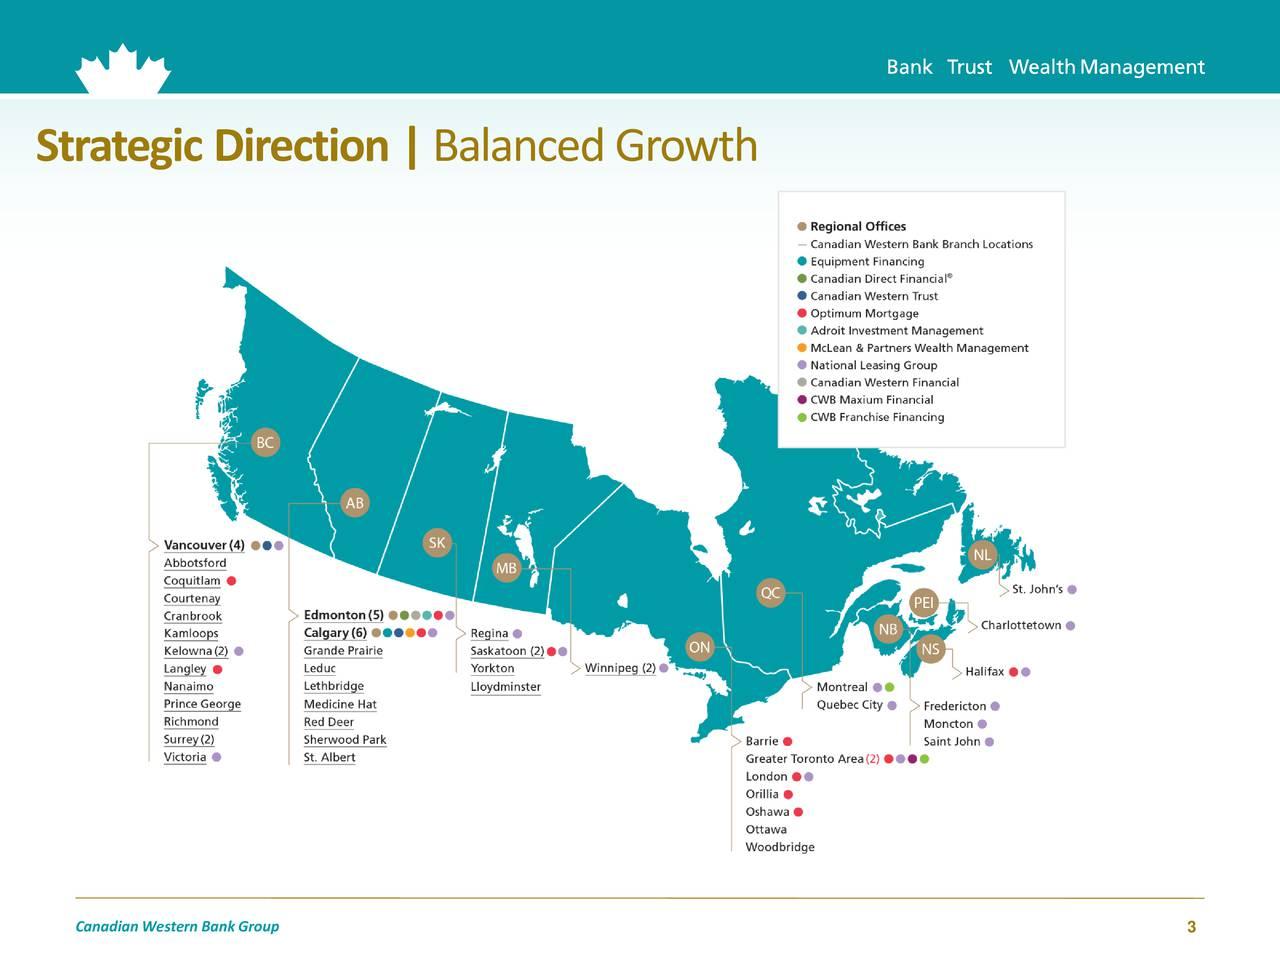 CanadianWestern Bank Group 3